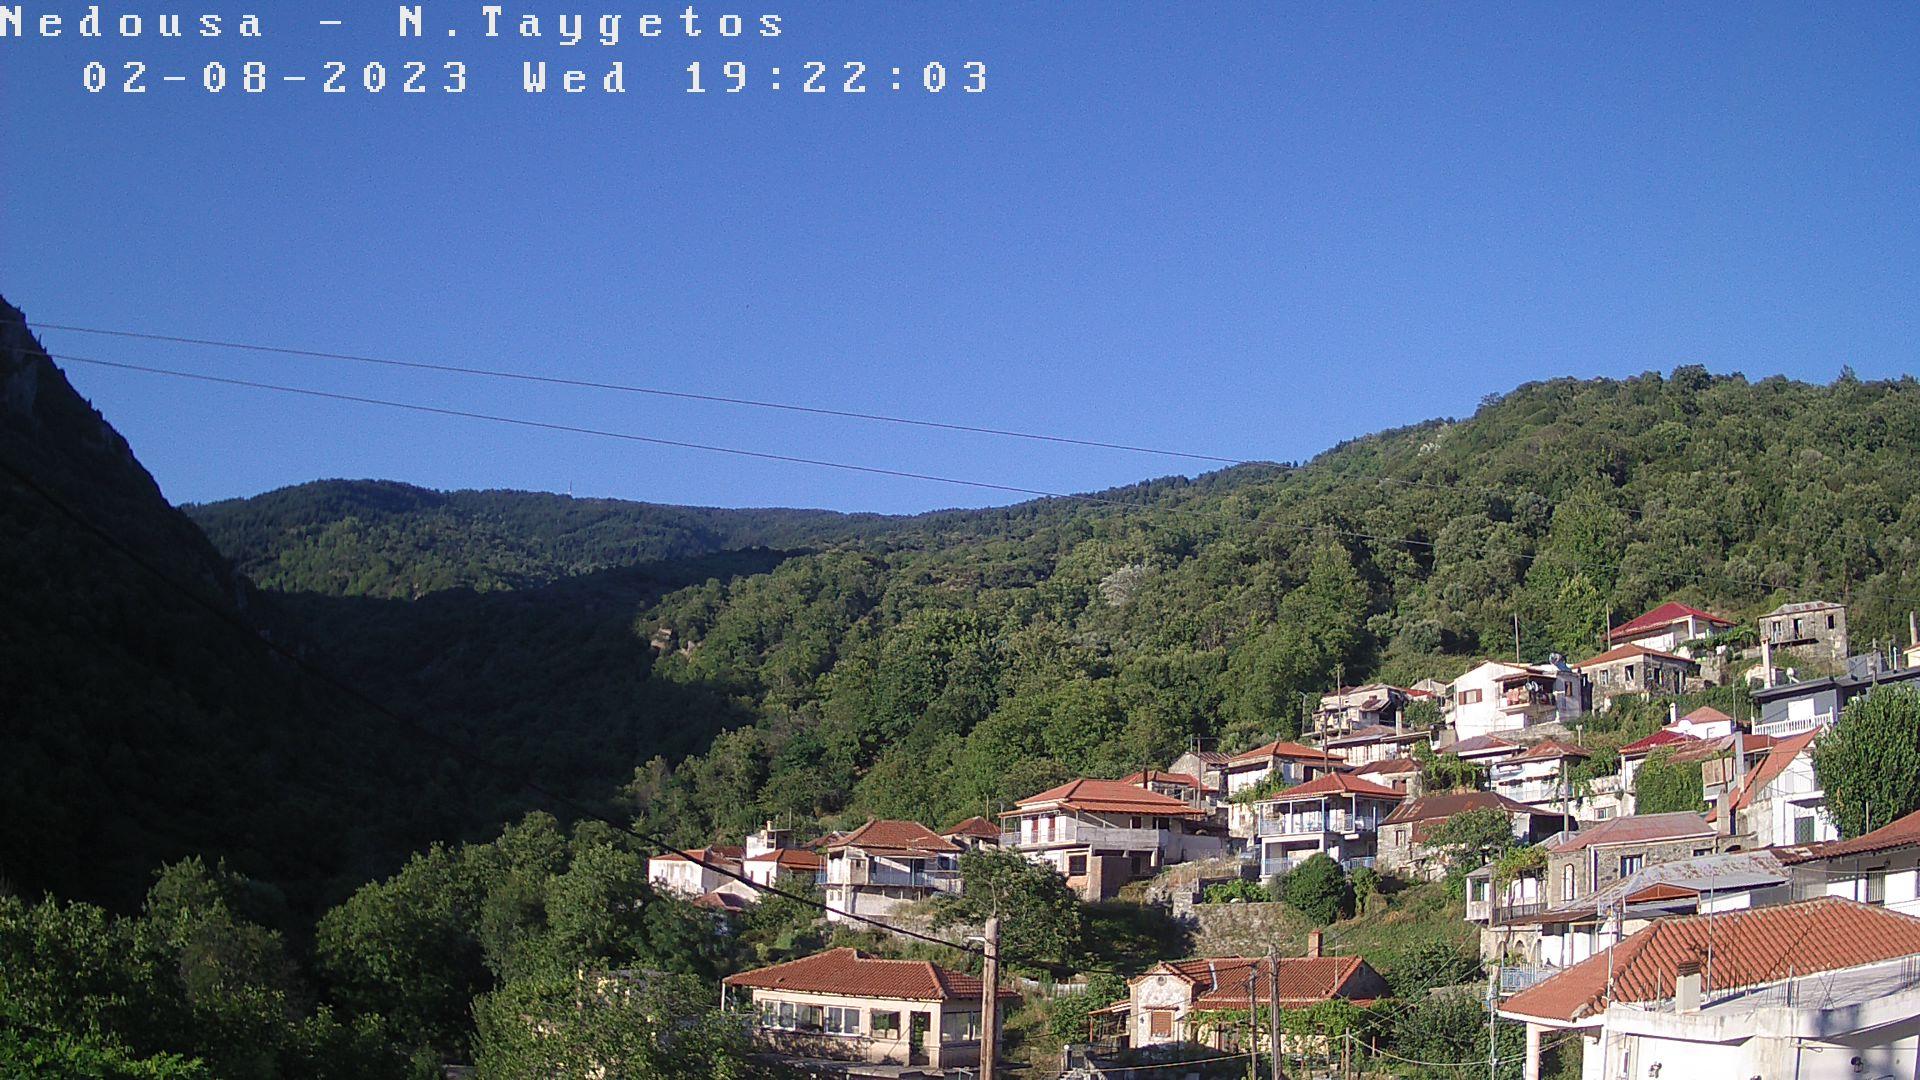 Webcam Nedoussa - Messinia - towards mount Malevo